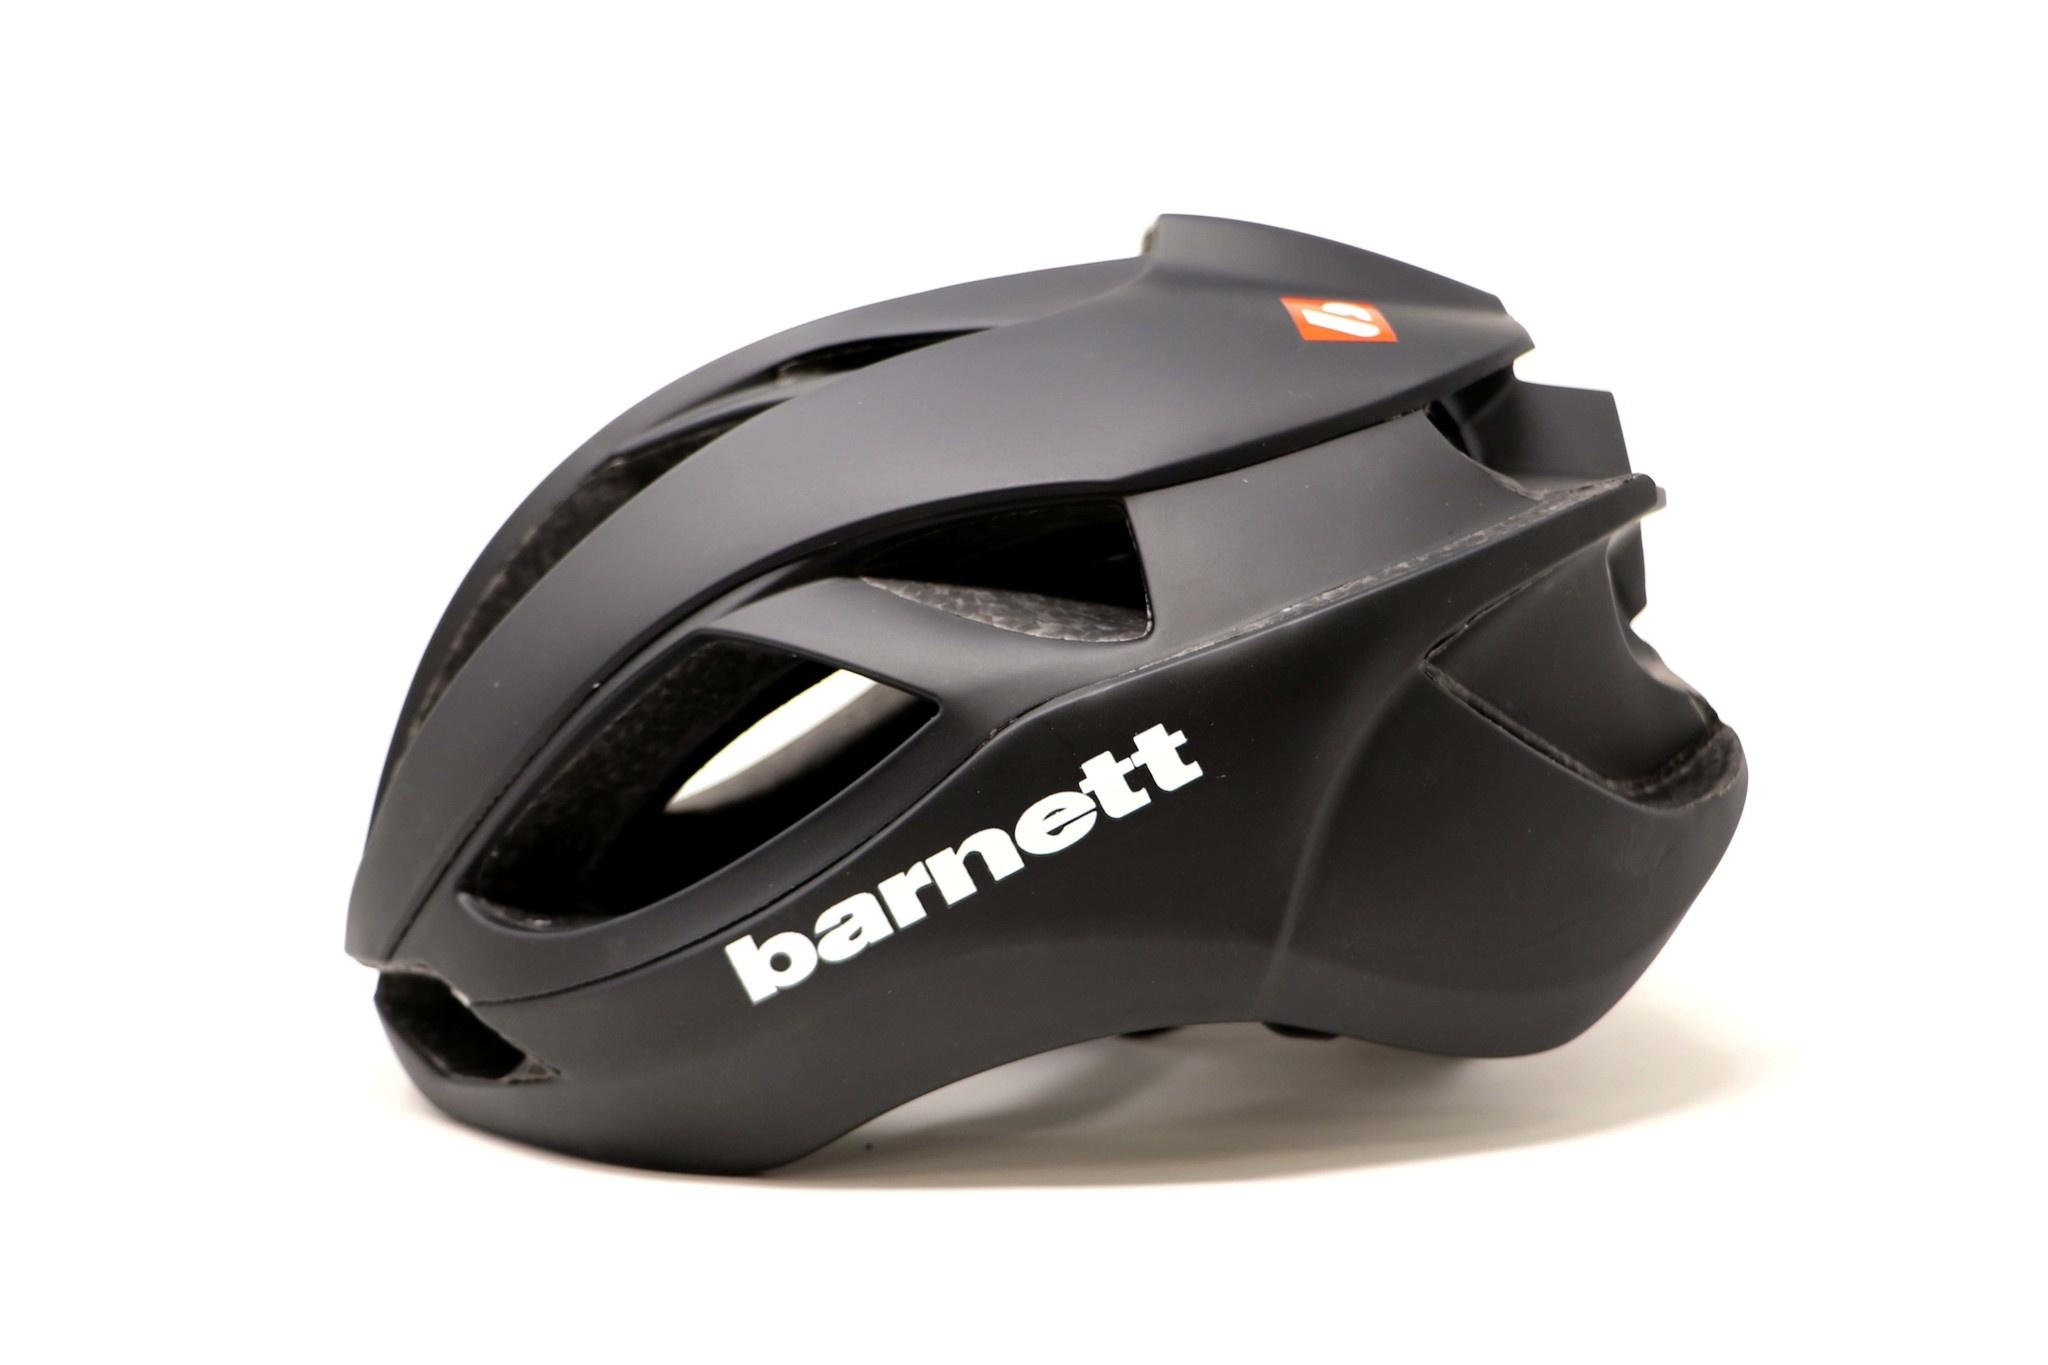 3515def7986 R1 Casco de Bicicleta y Roller Ski - barnett